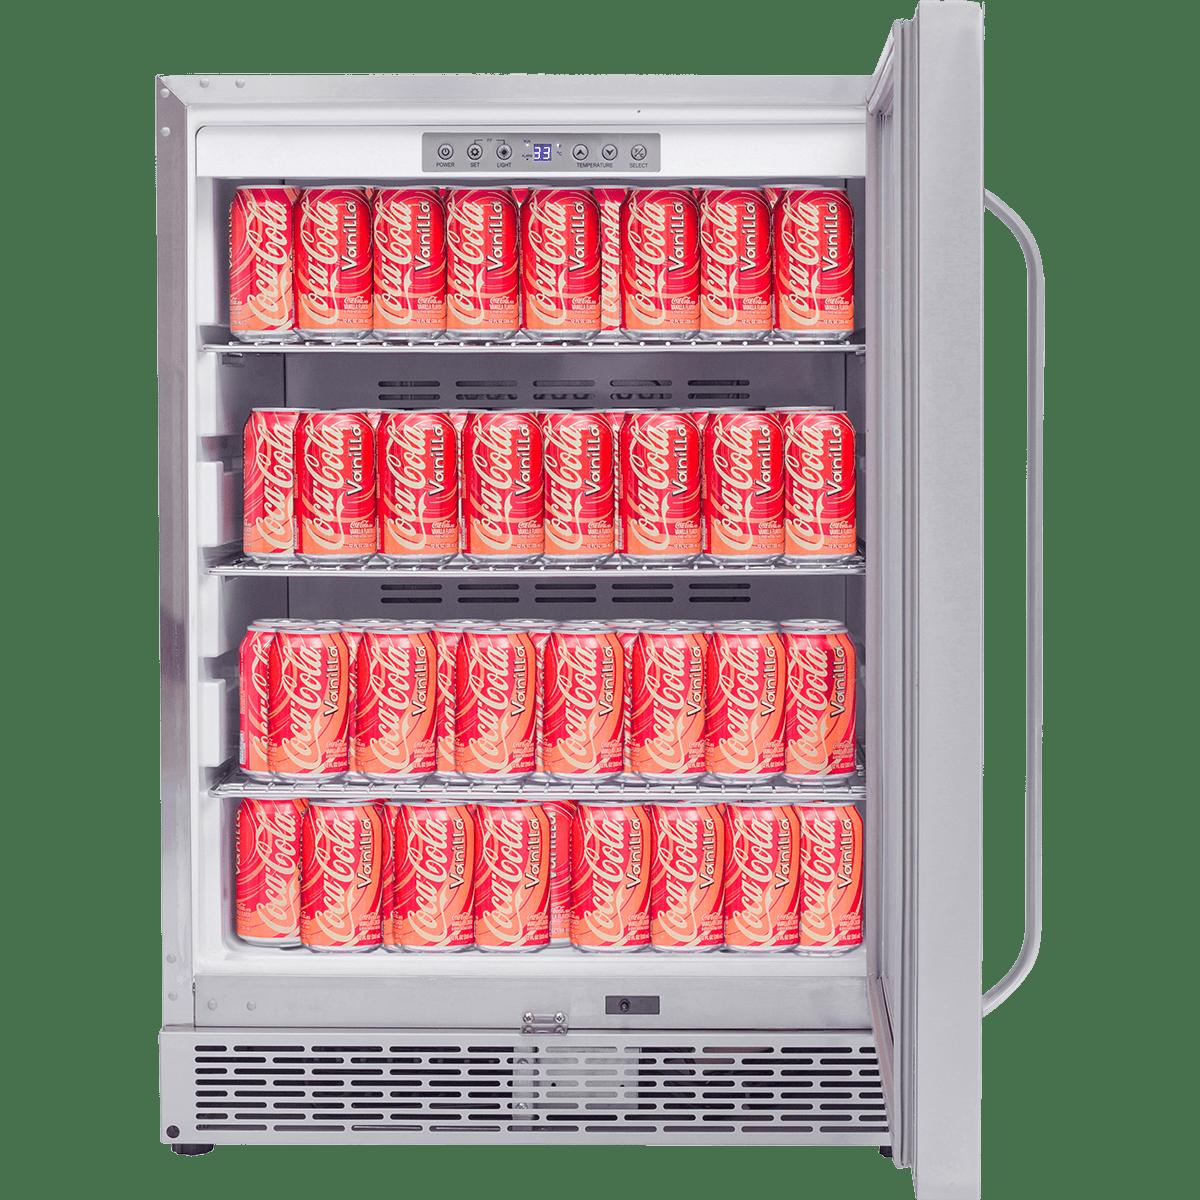 Whynter Built In Outdoor Beverage Cooler Bor 53024 Ssw